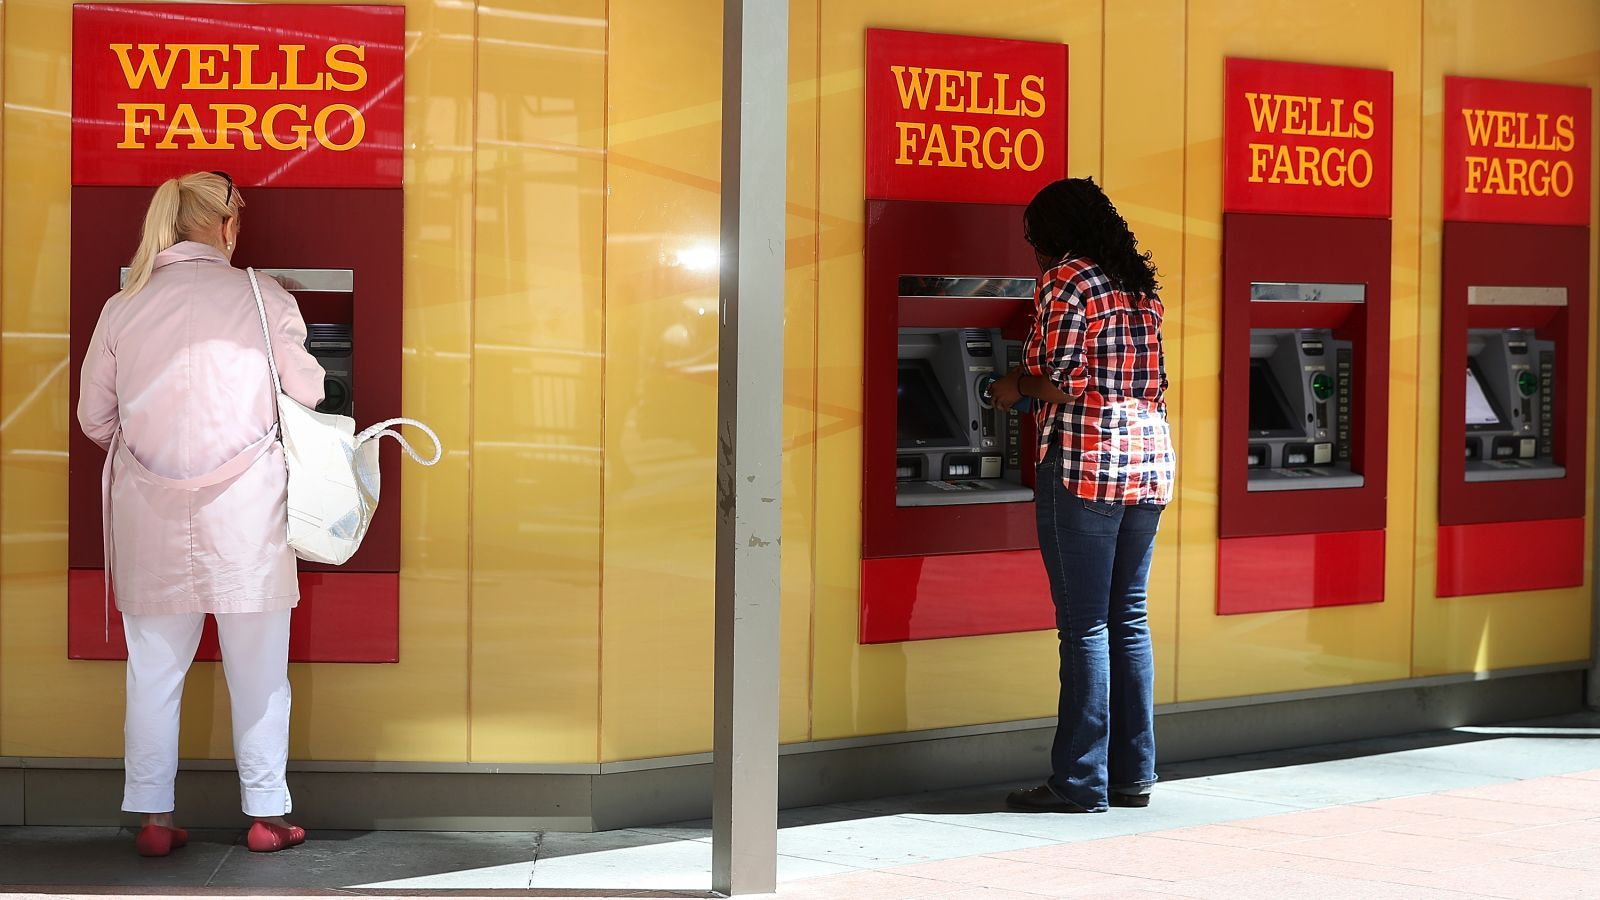 Wells Fargo Has Found 1 4 Million More Phony Accounts Somehow